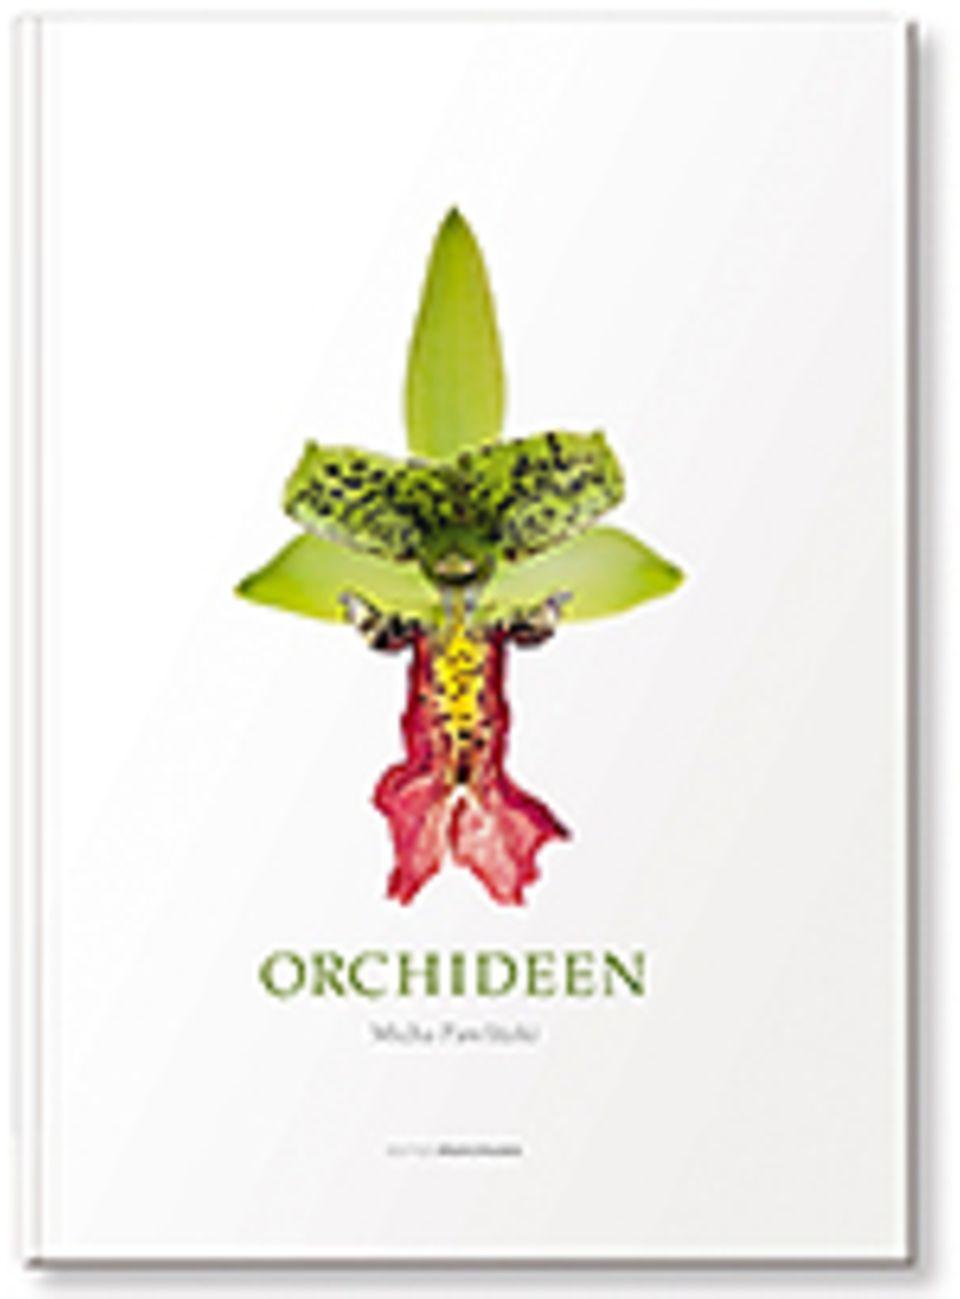 Orchideen: Micha Pawlitzki Orchideen 312 S., 450 Farbfotos Edition Panorama 2015 78 Euro